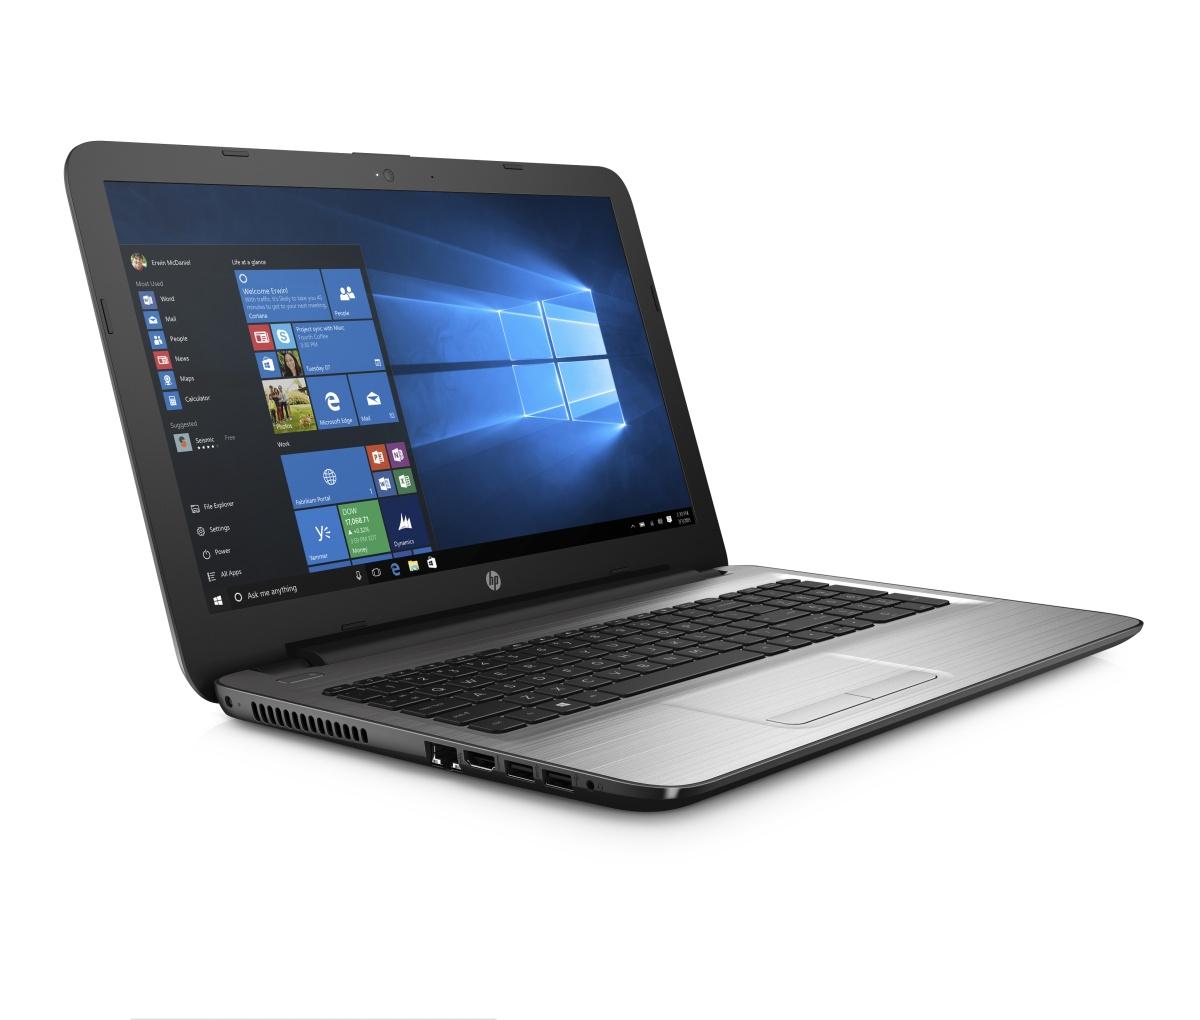 "HP 255 G5 15.6"" FHD/A6-7310/4GB/128SSD/DVD/HDMI/VGA/RJ45/WIFI/BT/MCR/1RServis/W10"